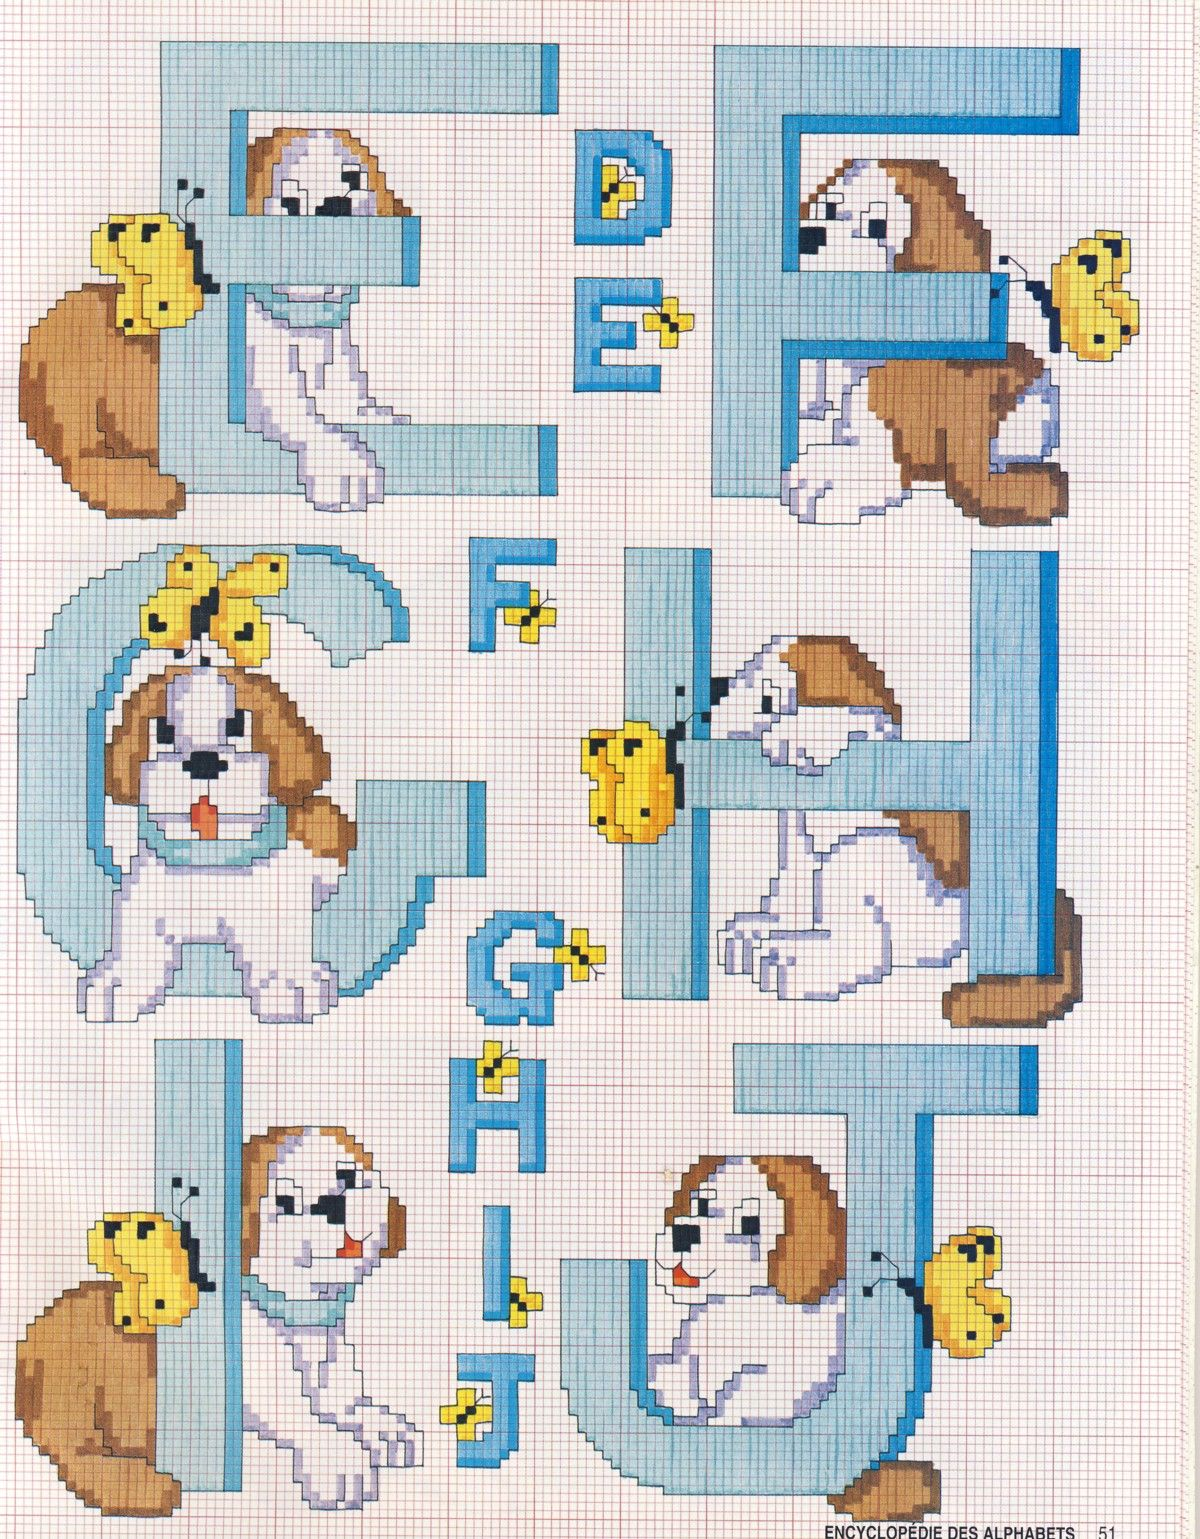 Schema punto croce alfabeto cane 2 punto de cruz cross for Ricamo punto croce lettere